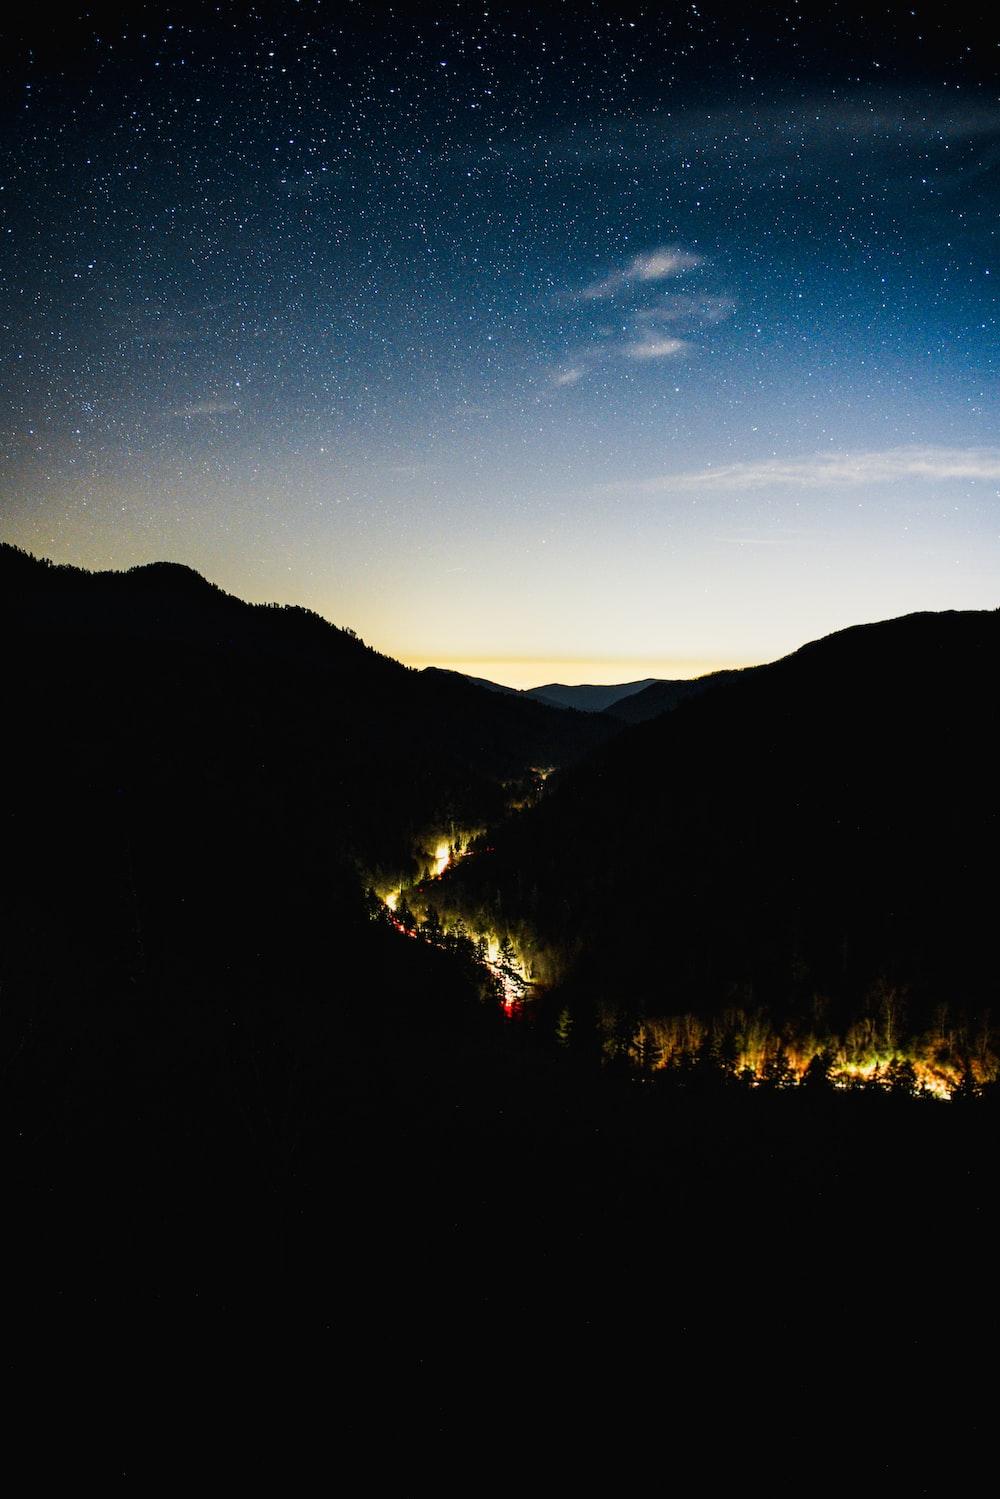 house lights between hills